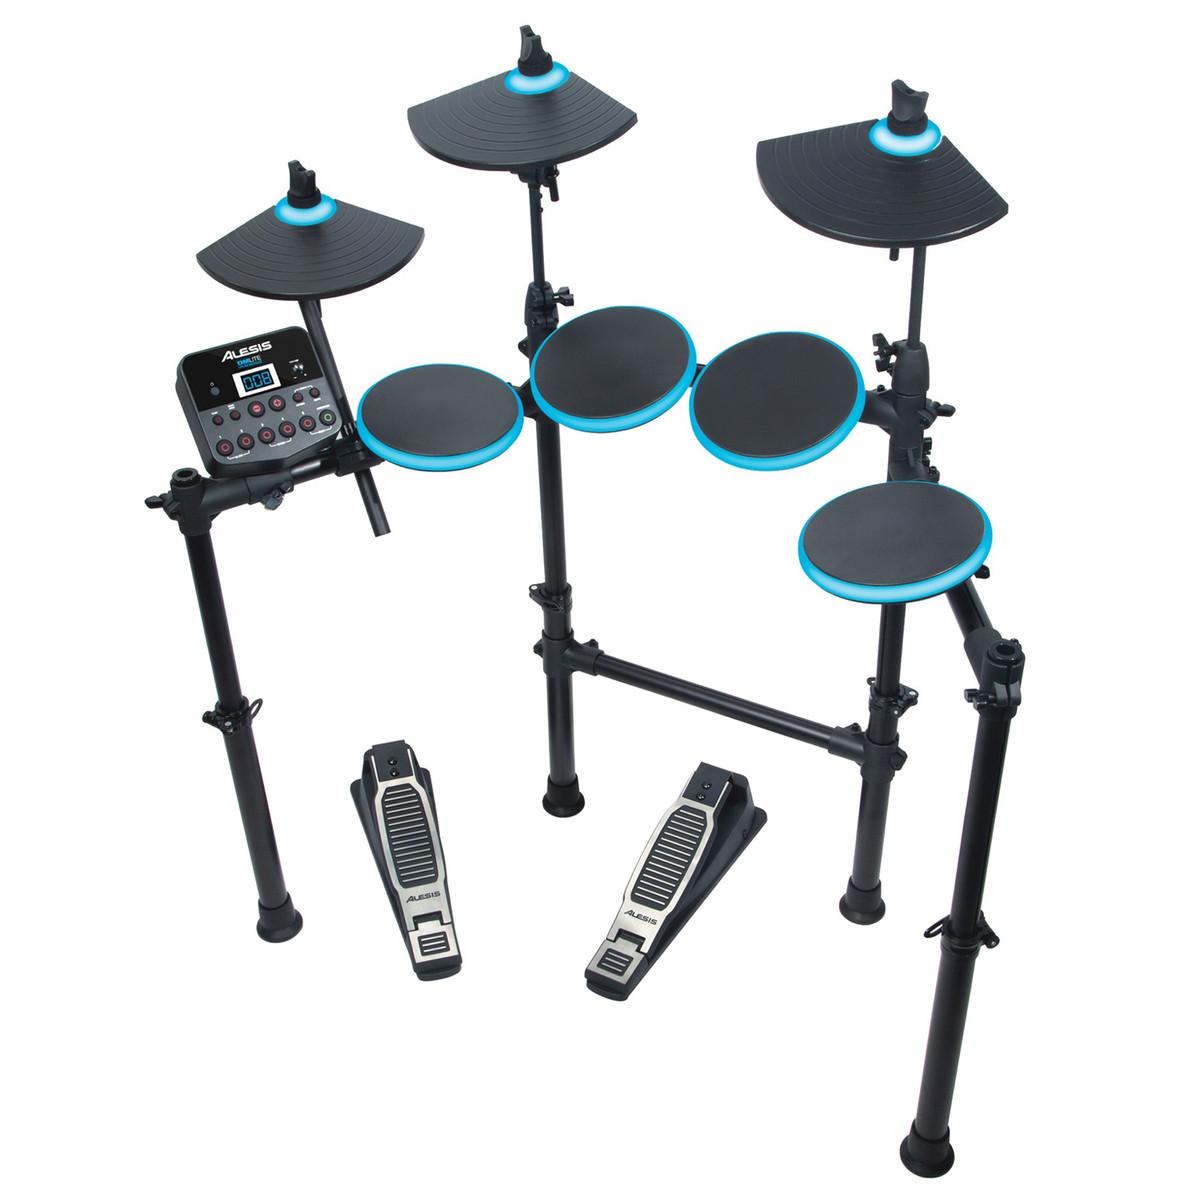 Alesis Vs Roland Vs Yamaha Drums